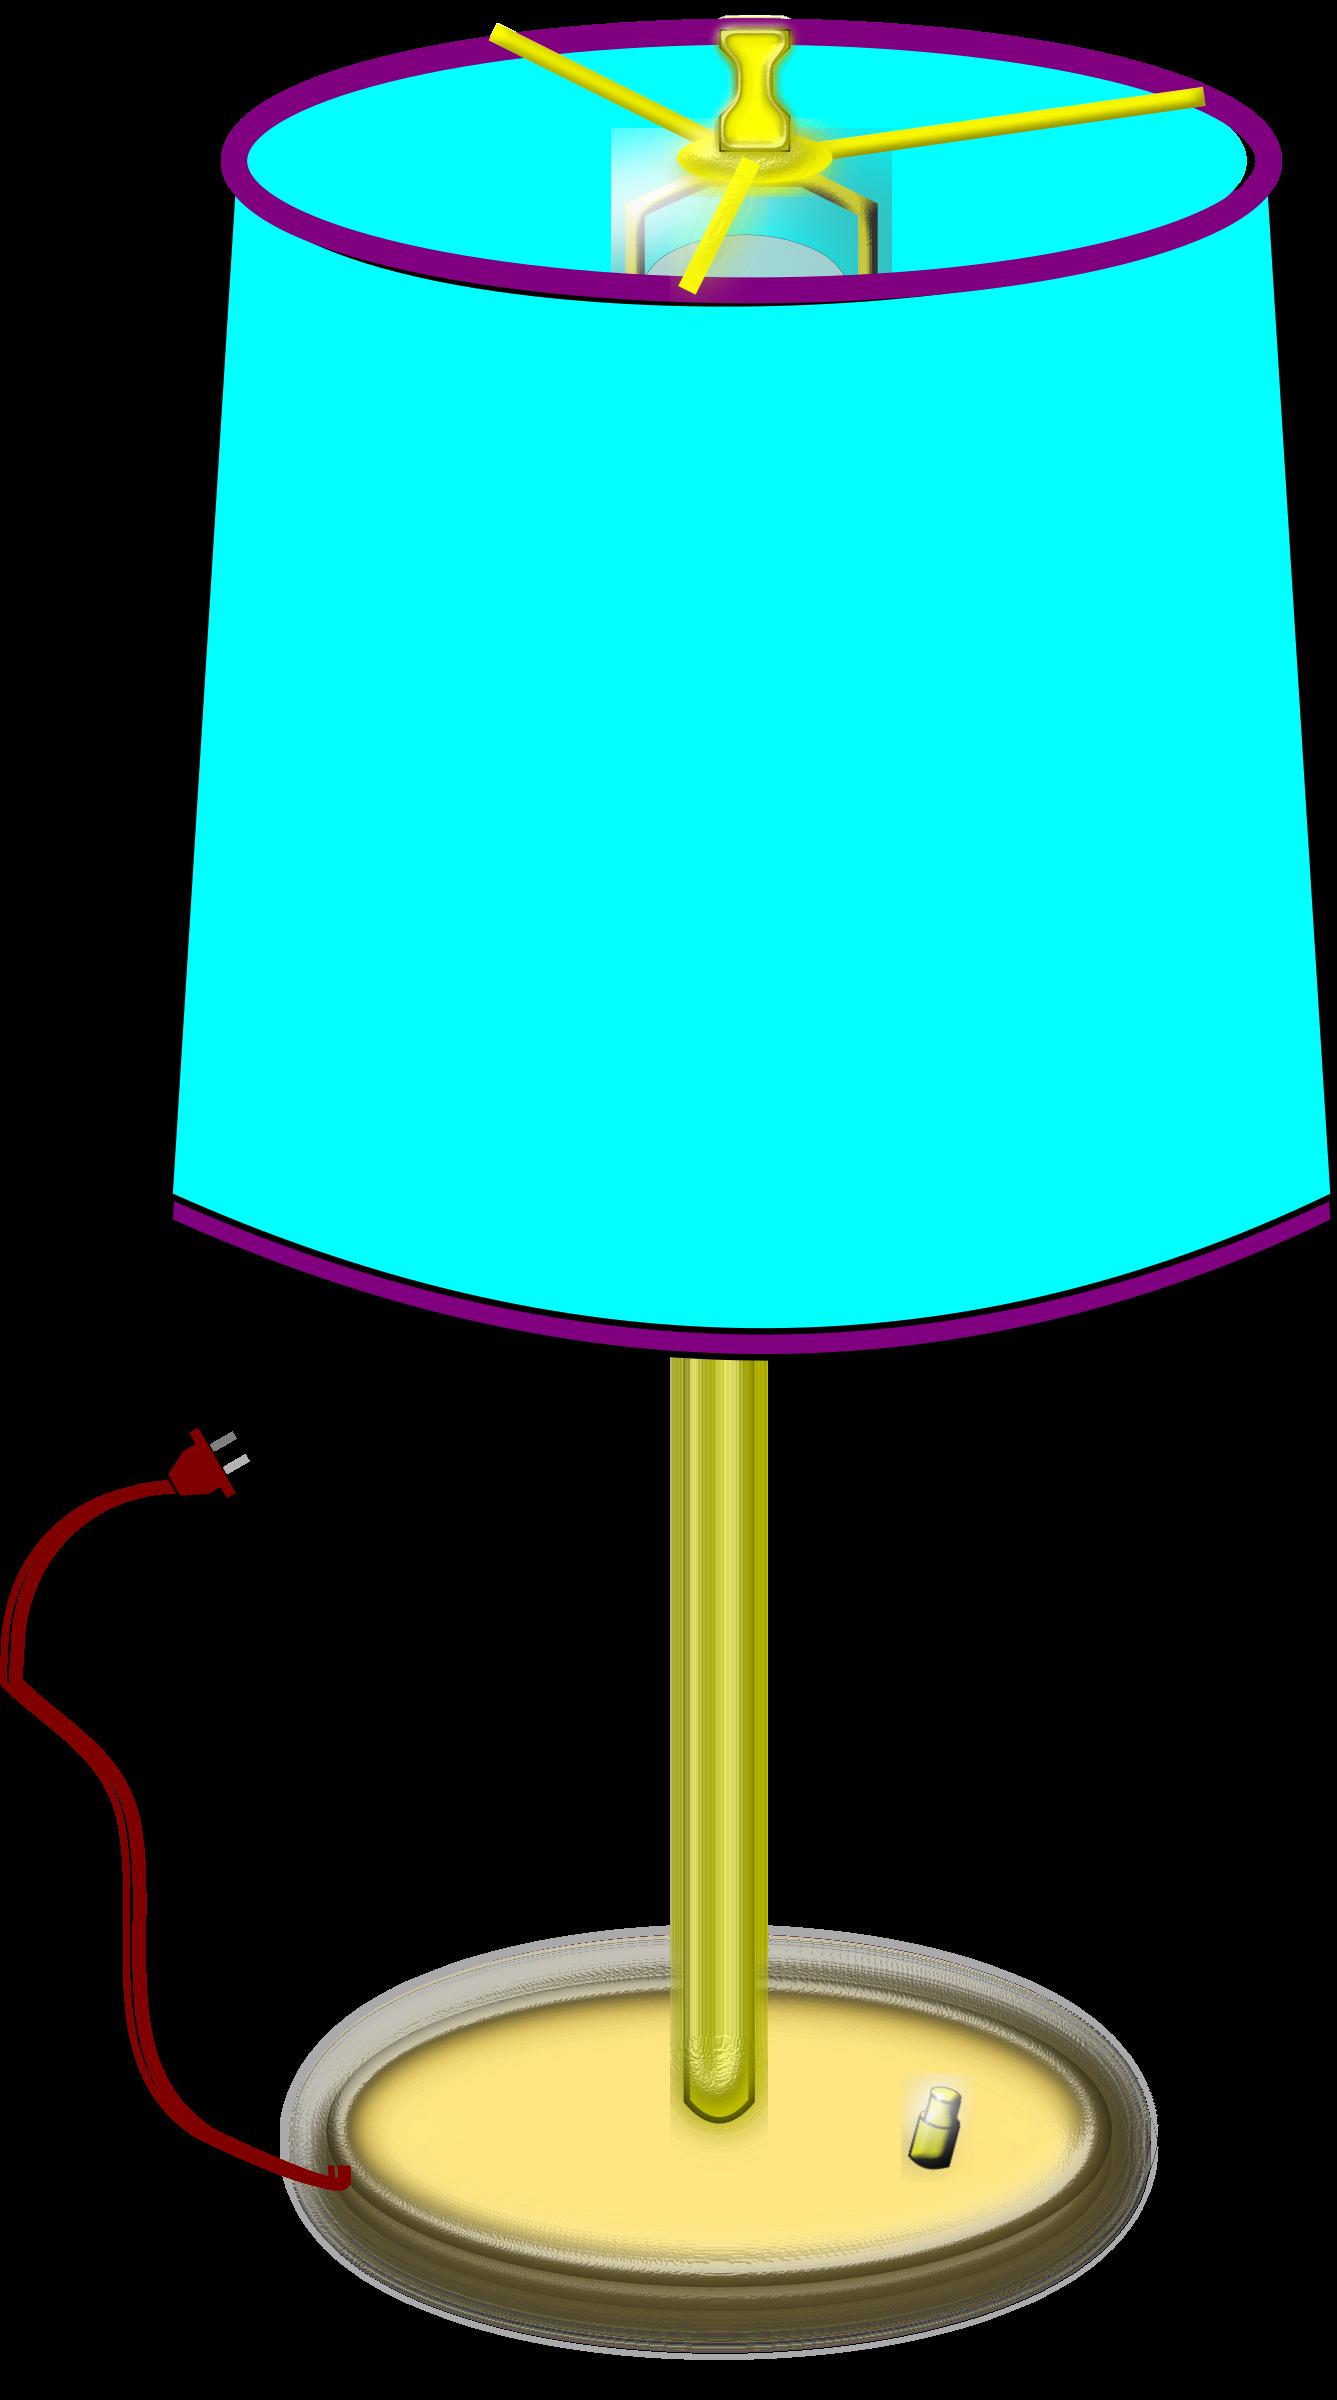 Lamp clipart modern lamp, Lamp modern lamp Transparent FREE.